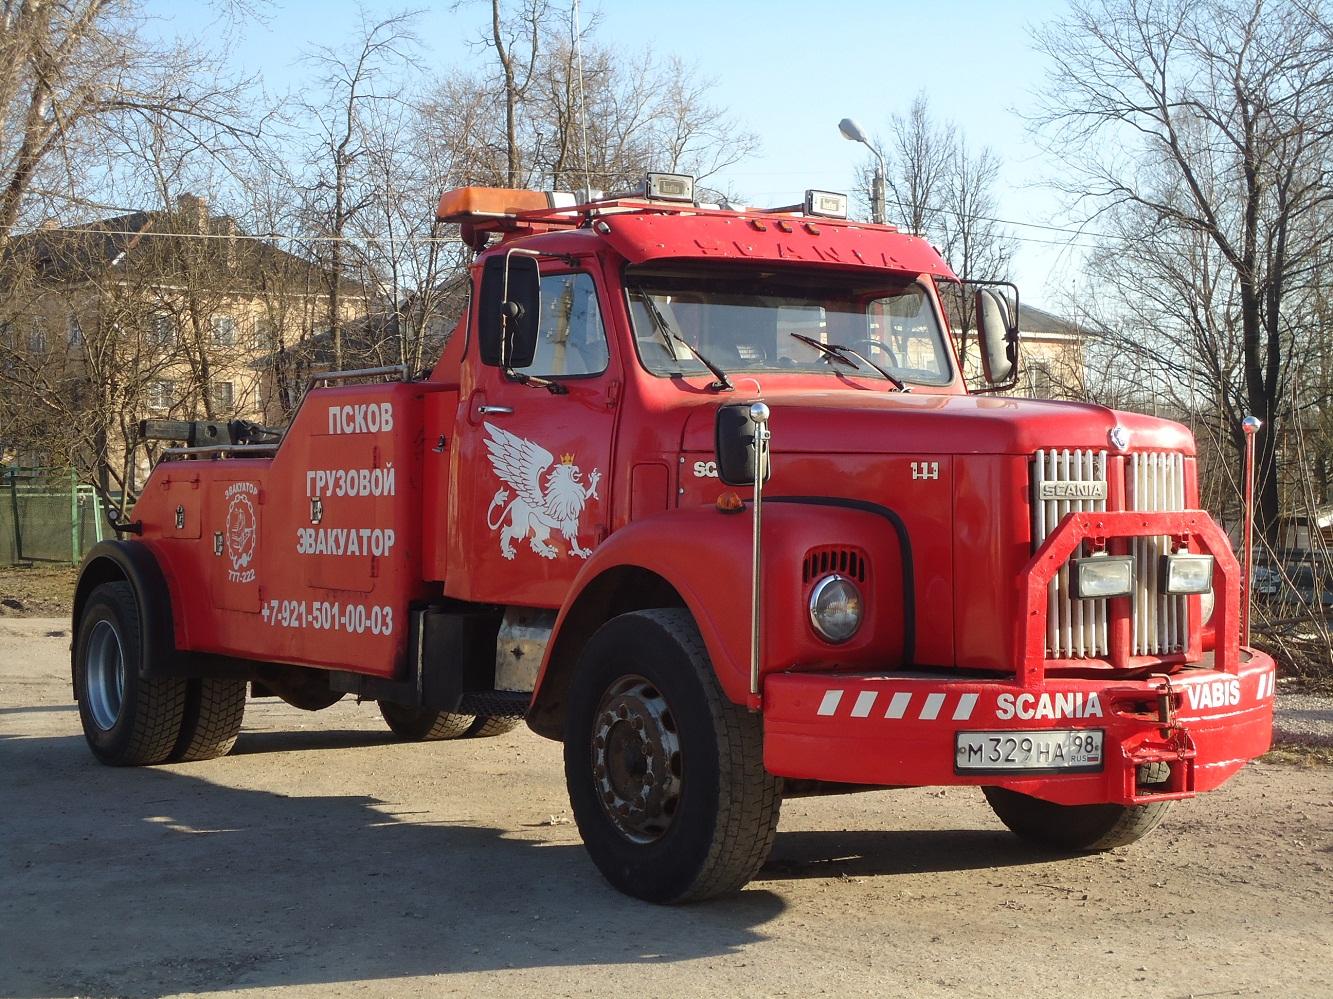 Эвакуатор на шасси Scania  LS 111S46 #М 329 НА 98. Псков, улица Леона Поземского